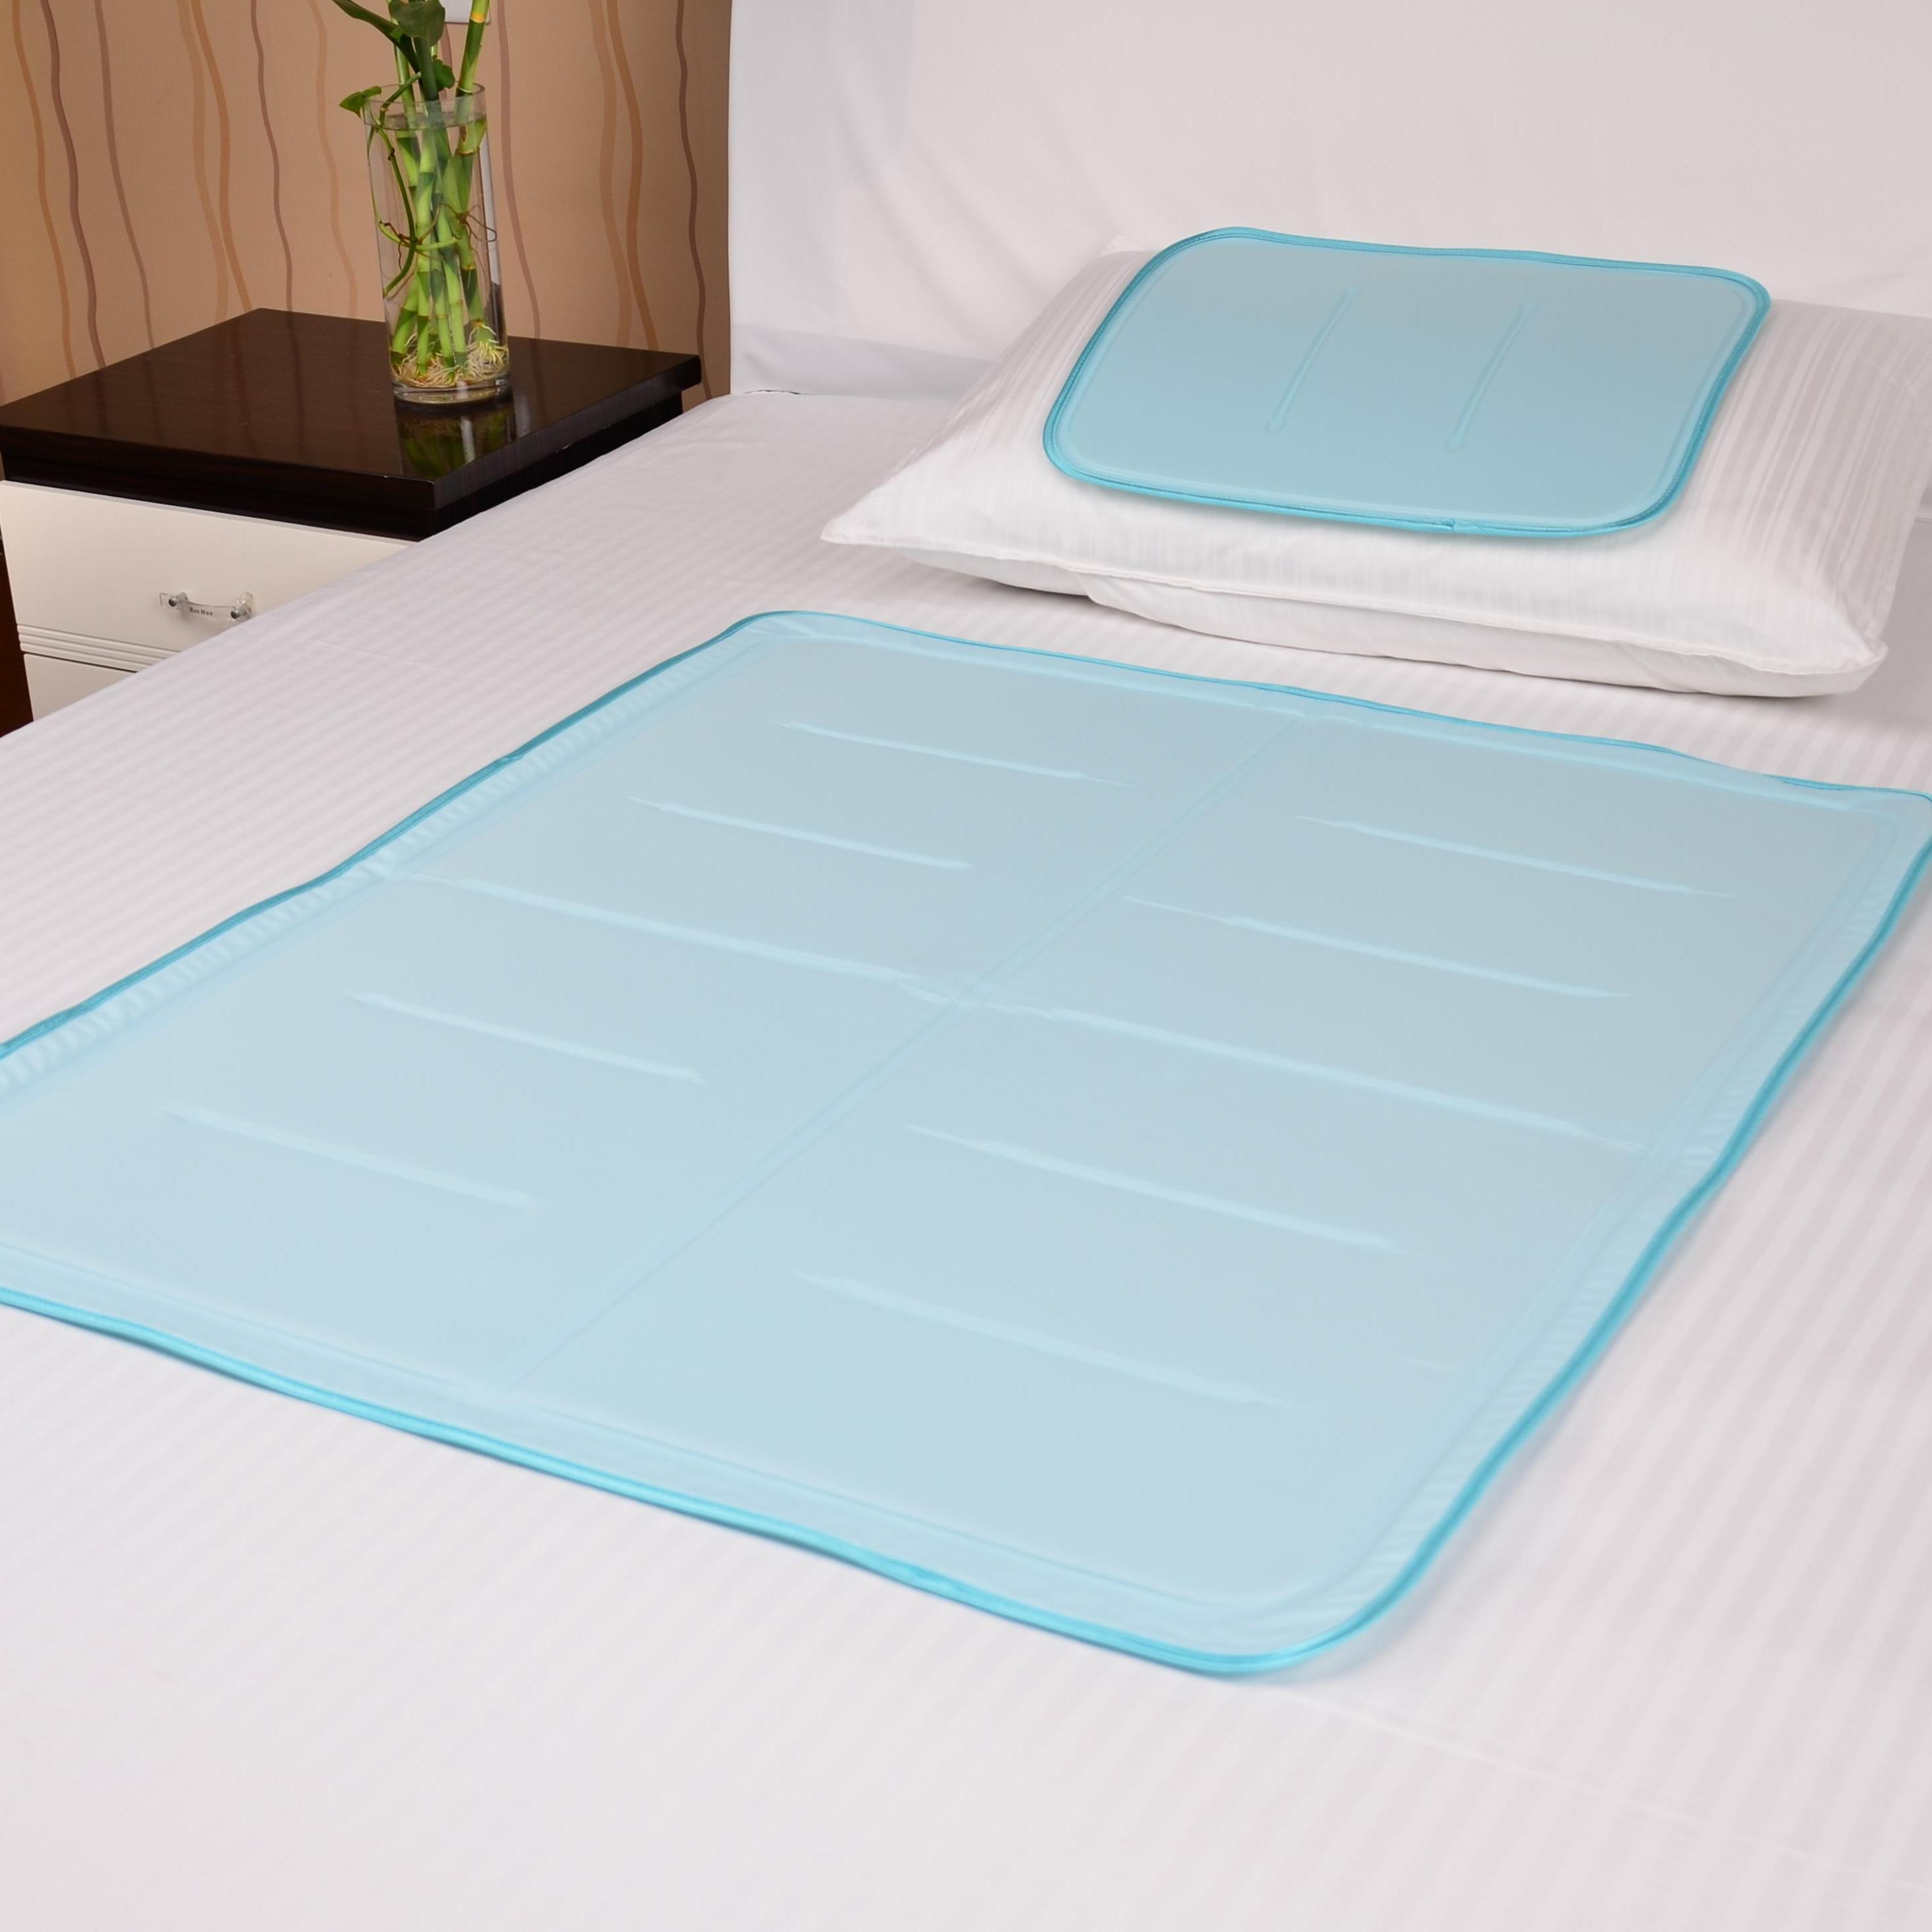 High Quality Bed Mat Use cool gel sleeping mattress - Jozy Mattress   Jozy.net